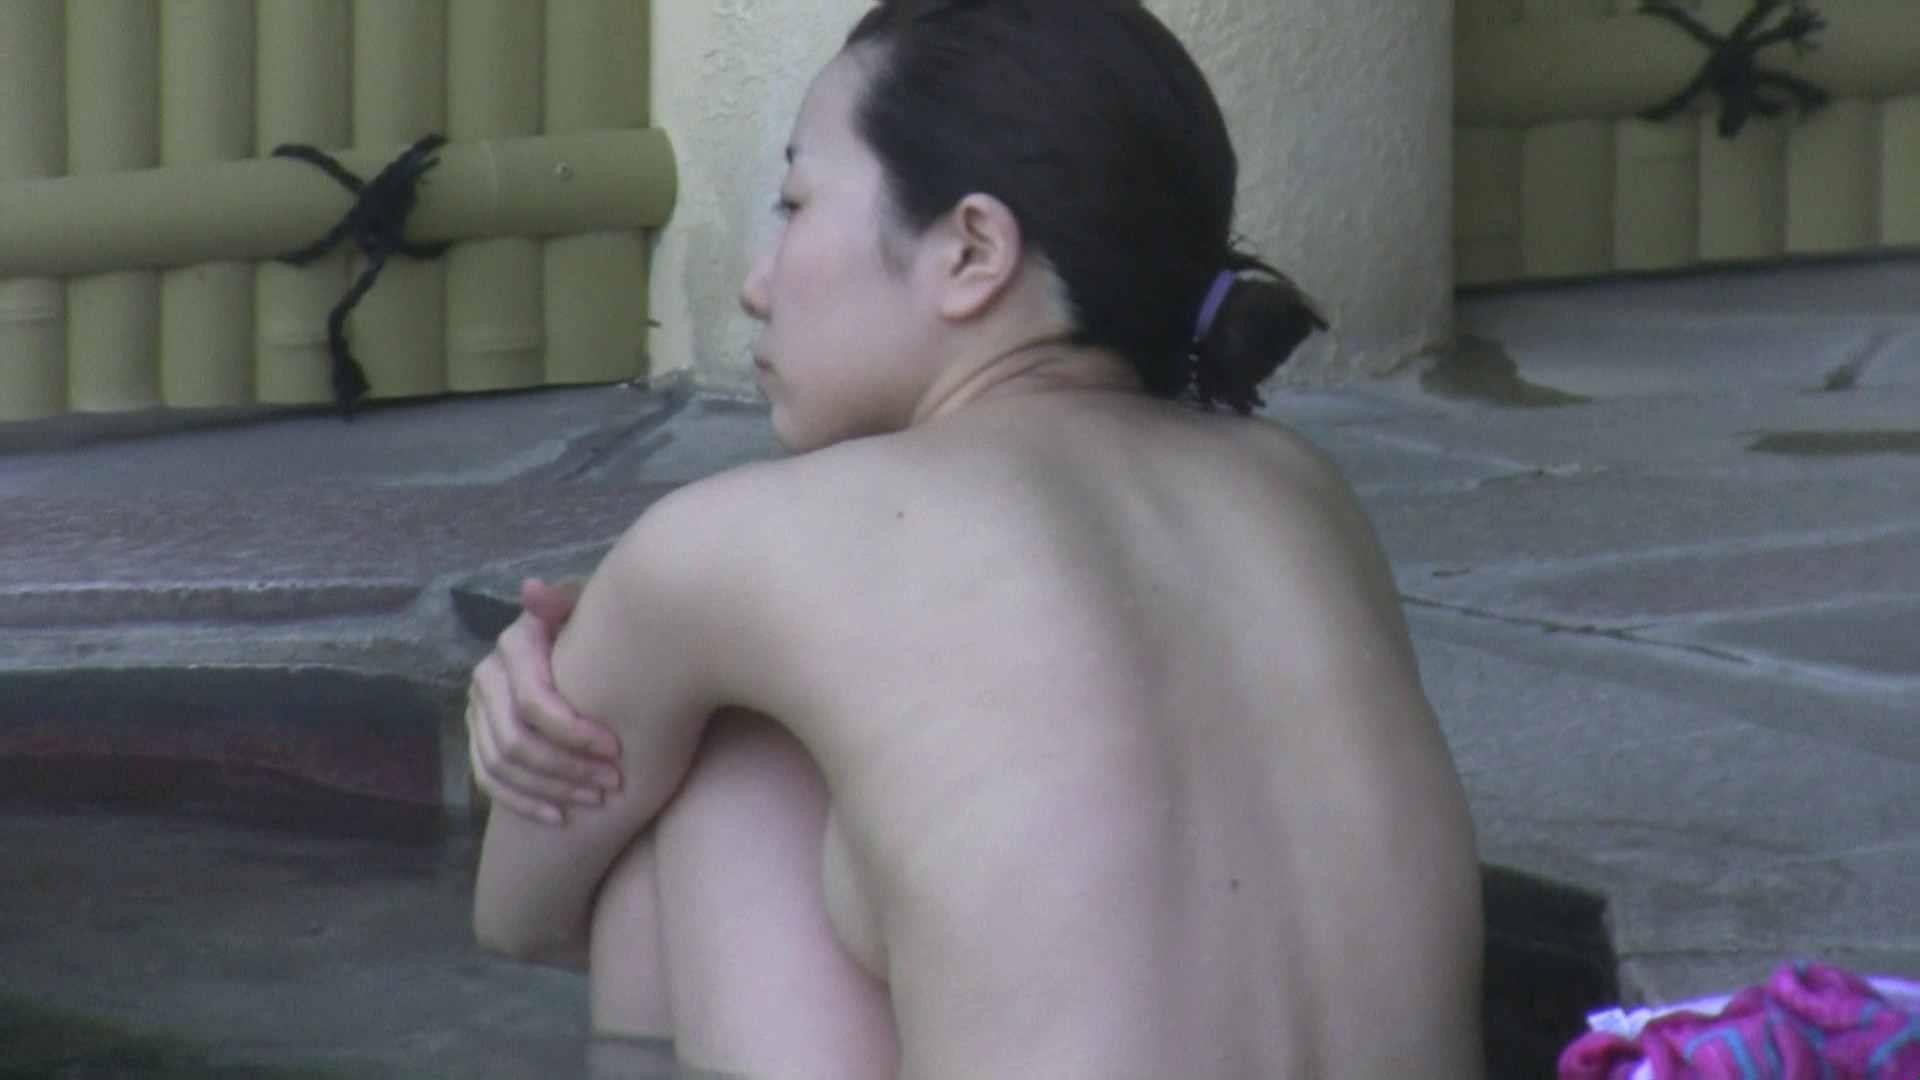 Aquaな露天風呂Vol.88【VIP限定】 盗撮 オマンコ無修正動画無料 61連発 32